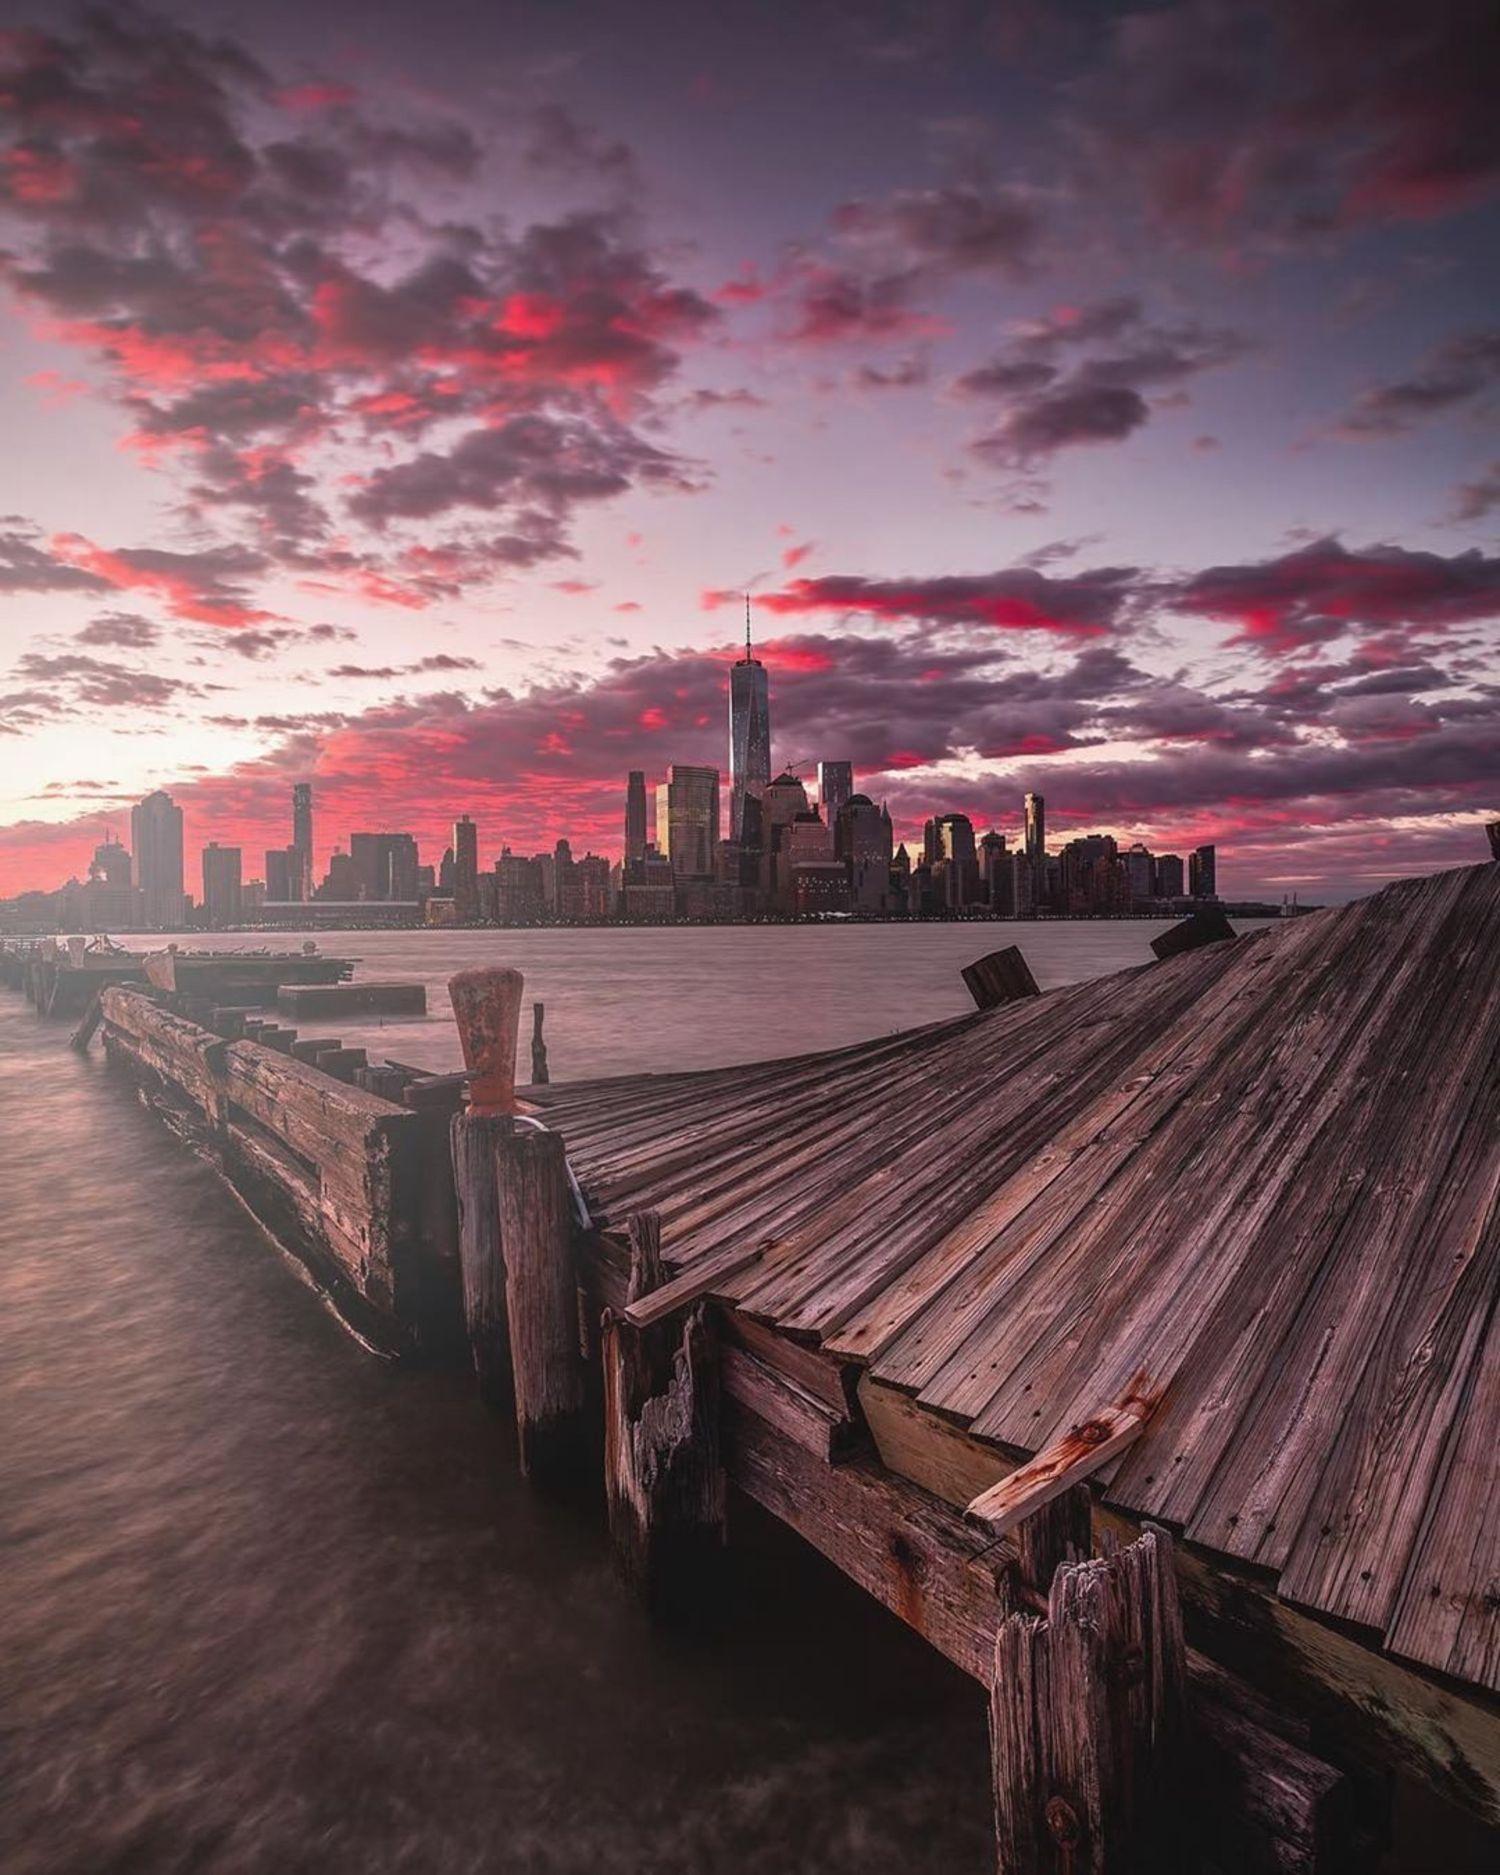 New York, New York. Photo via @beholdingeye #viewingnyc #nyc #newyork #newyorkcity